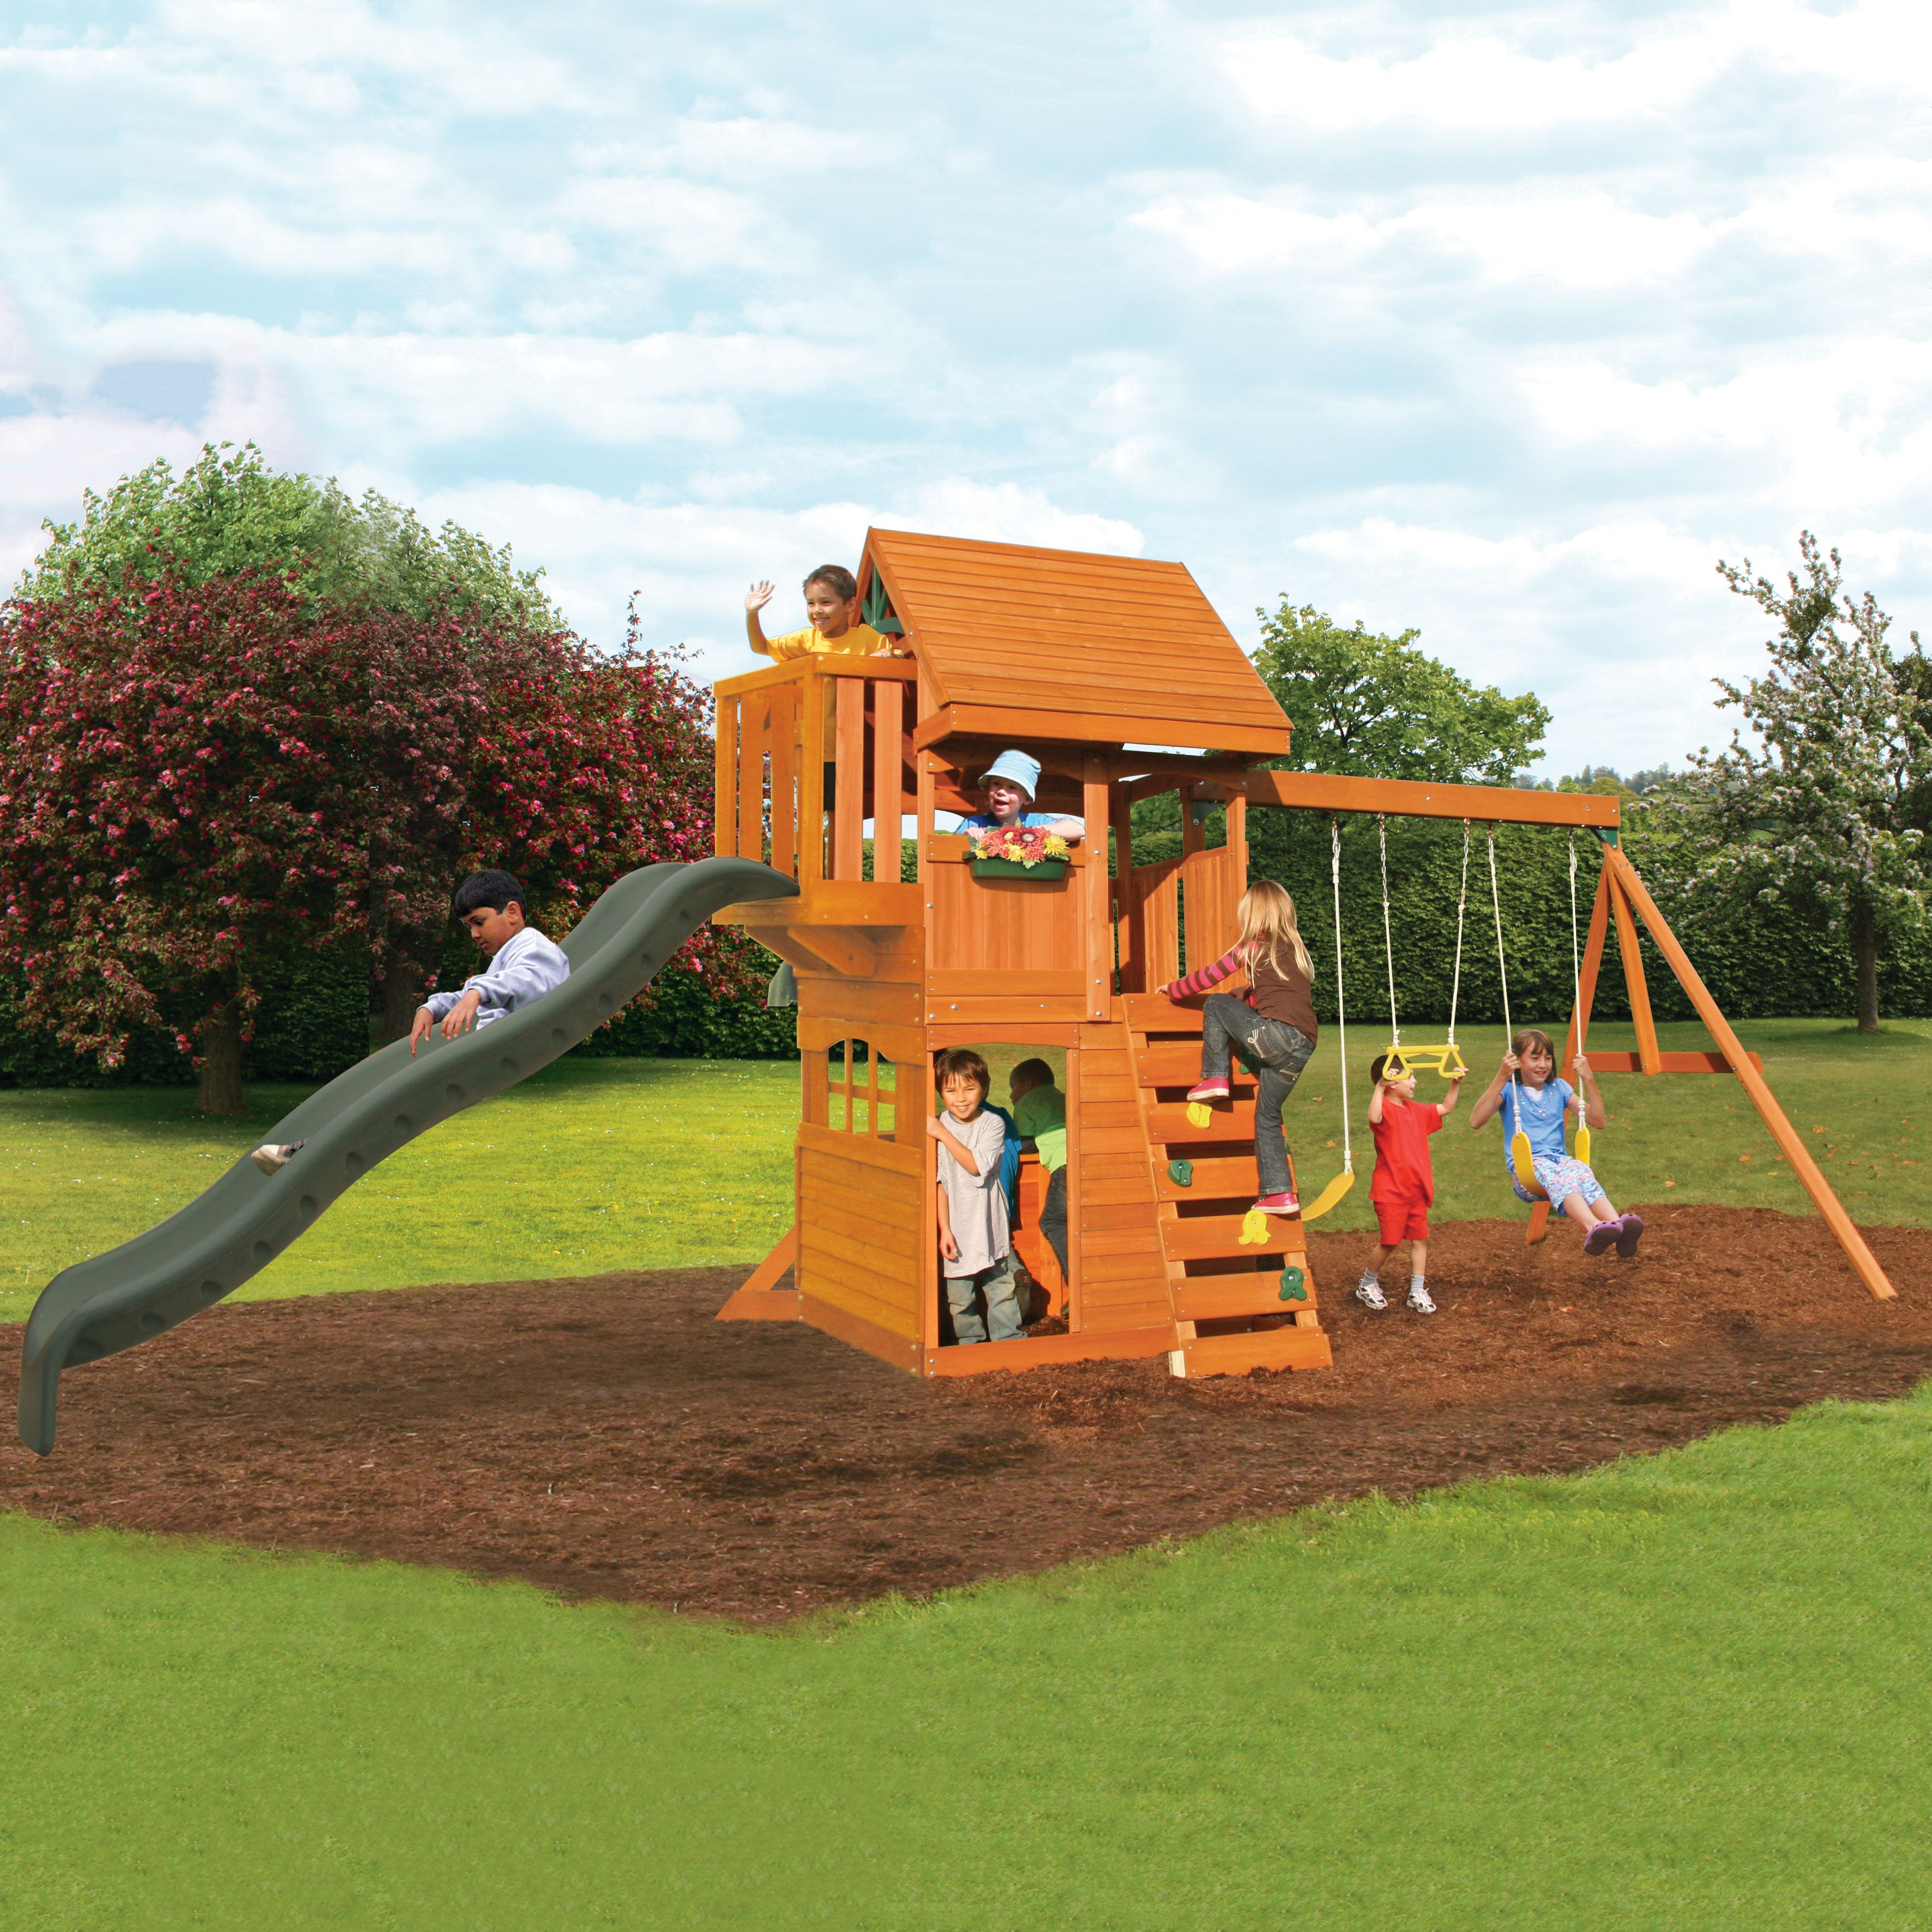 Toys Wooden Playset Wooden Swings Grandview Lodge